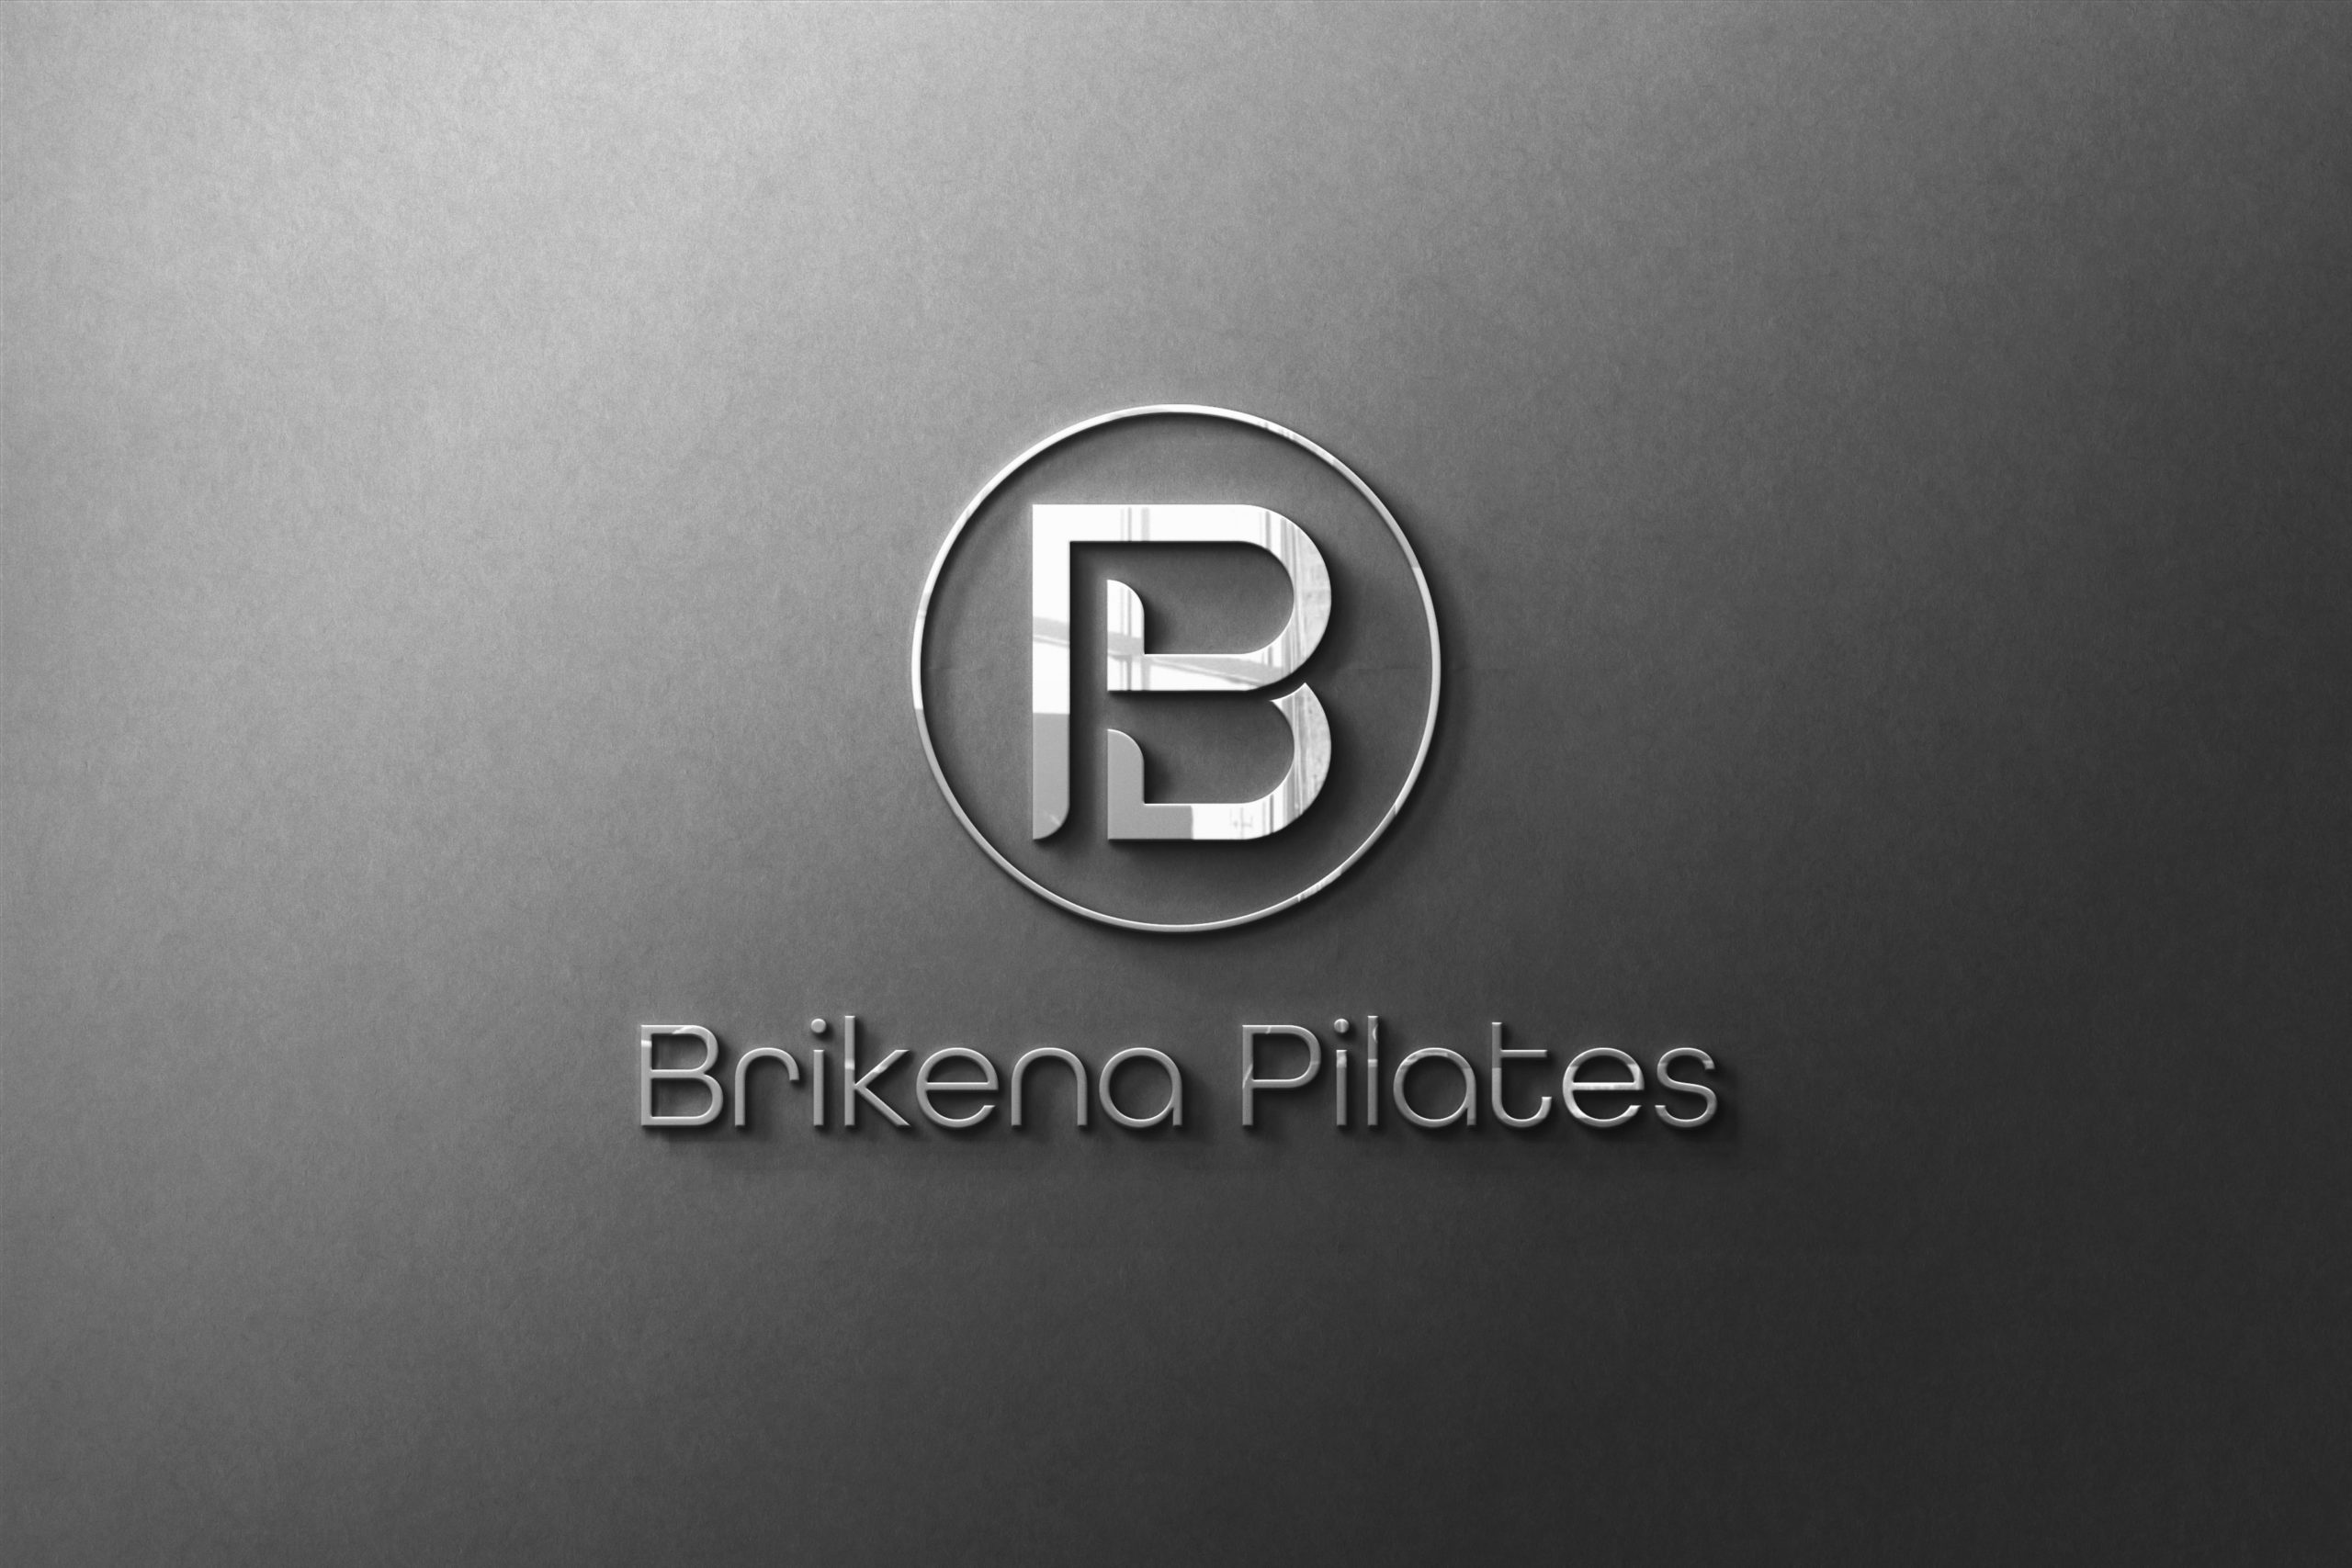 Brikena Pilates – Brooklyn, USA / SEP 2020